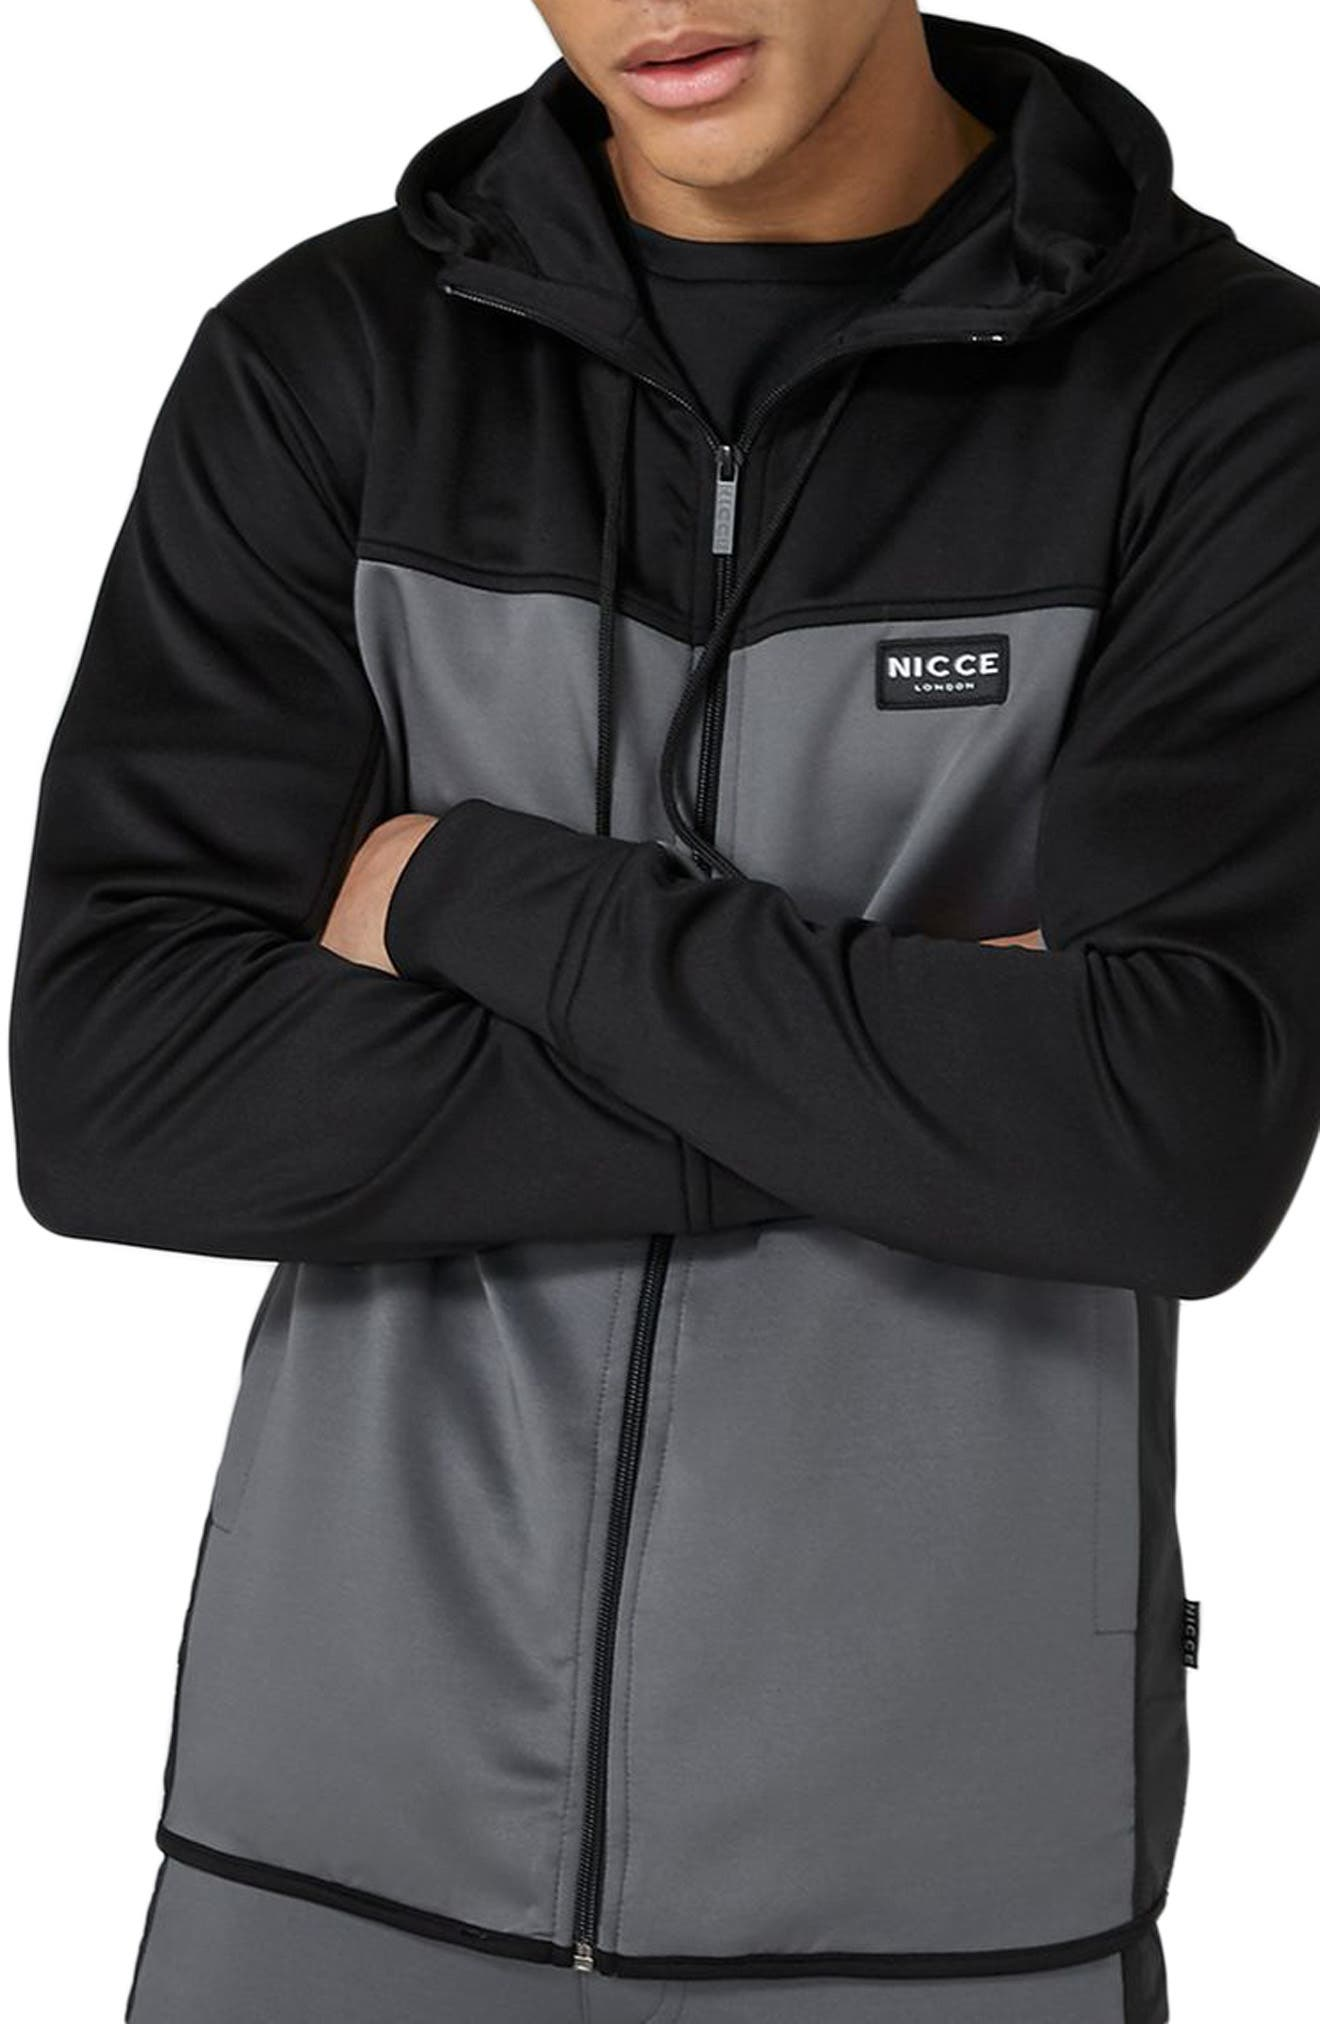 Topshop NICCE Hybrid Track Jacket,                         Main,                         color, 001